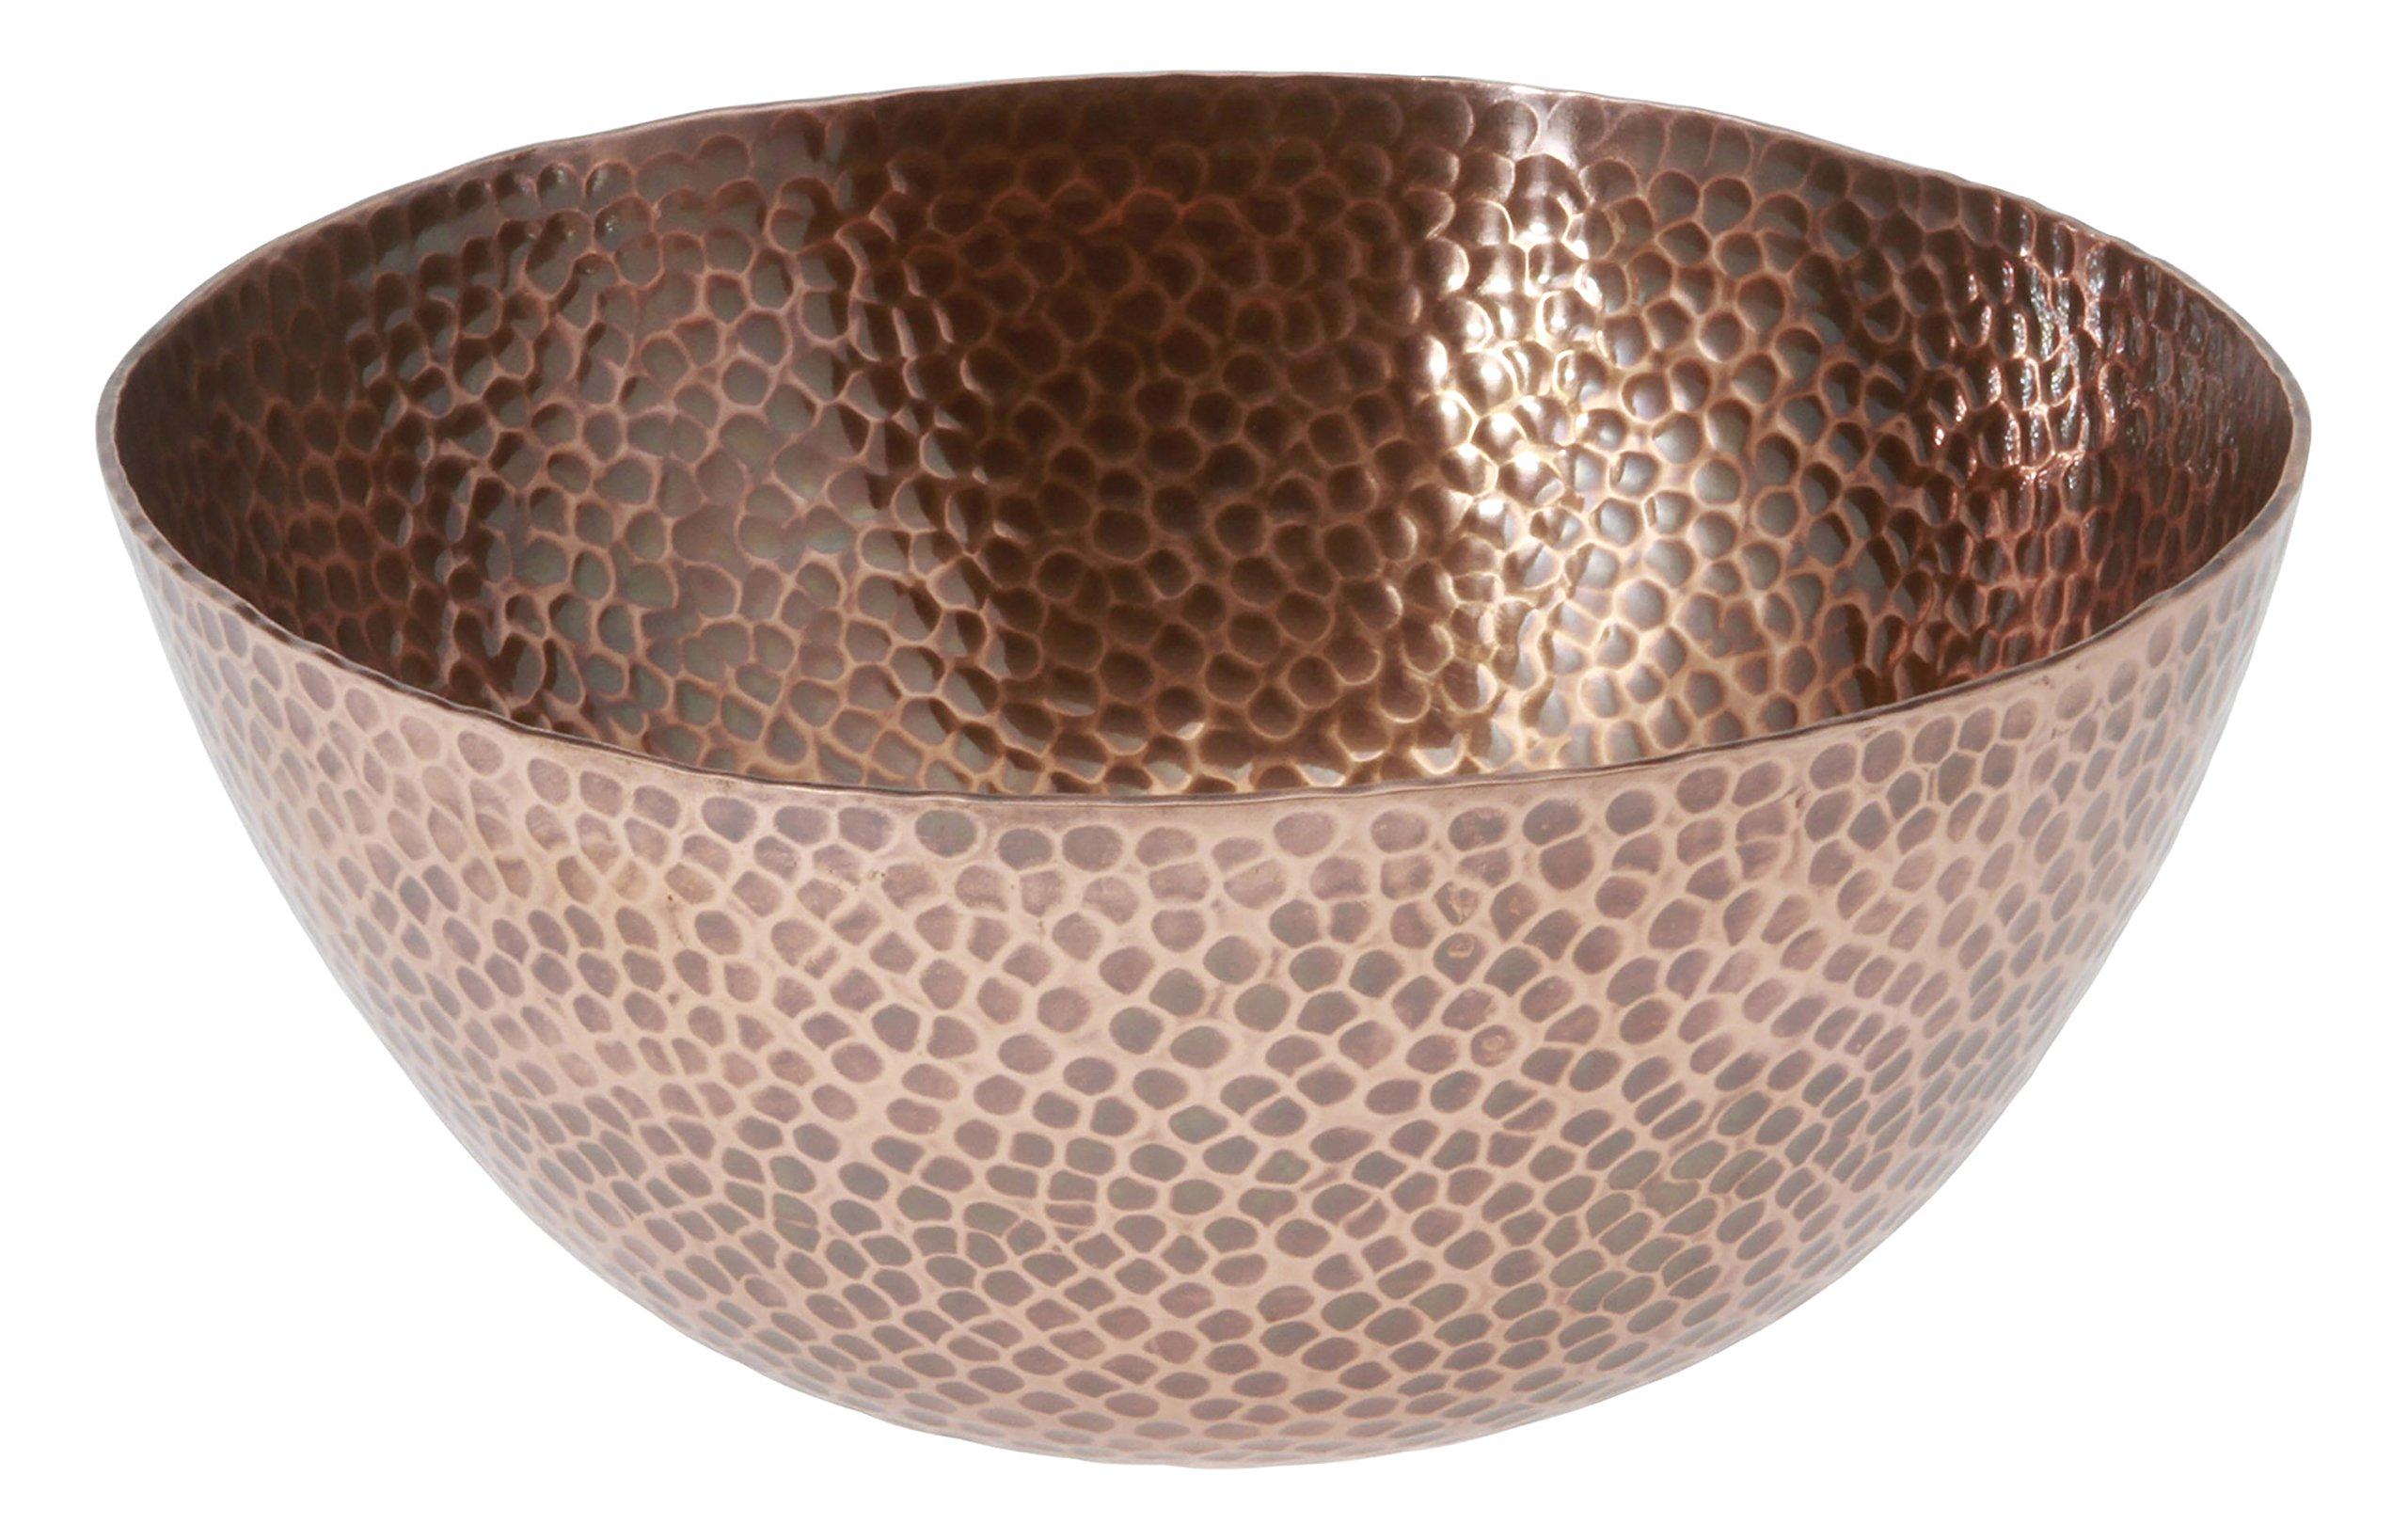 Thirstystone N372 Urban Farm Large Round Hammered Antique Finish Bowl, Copper